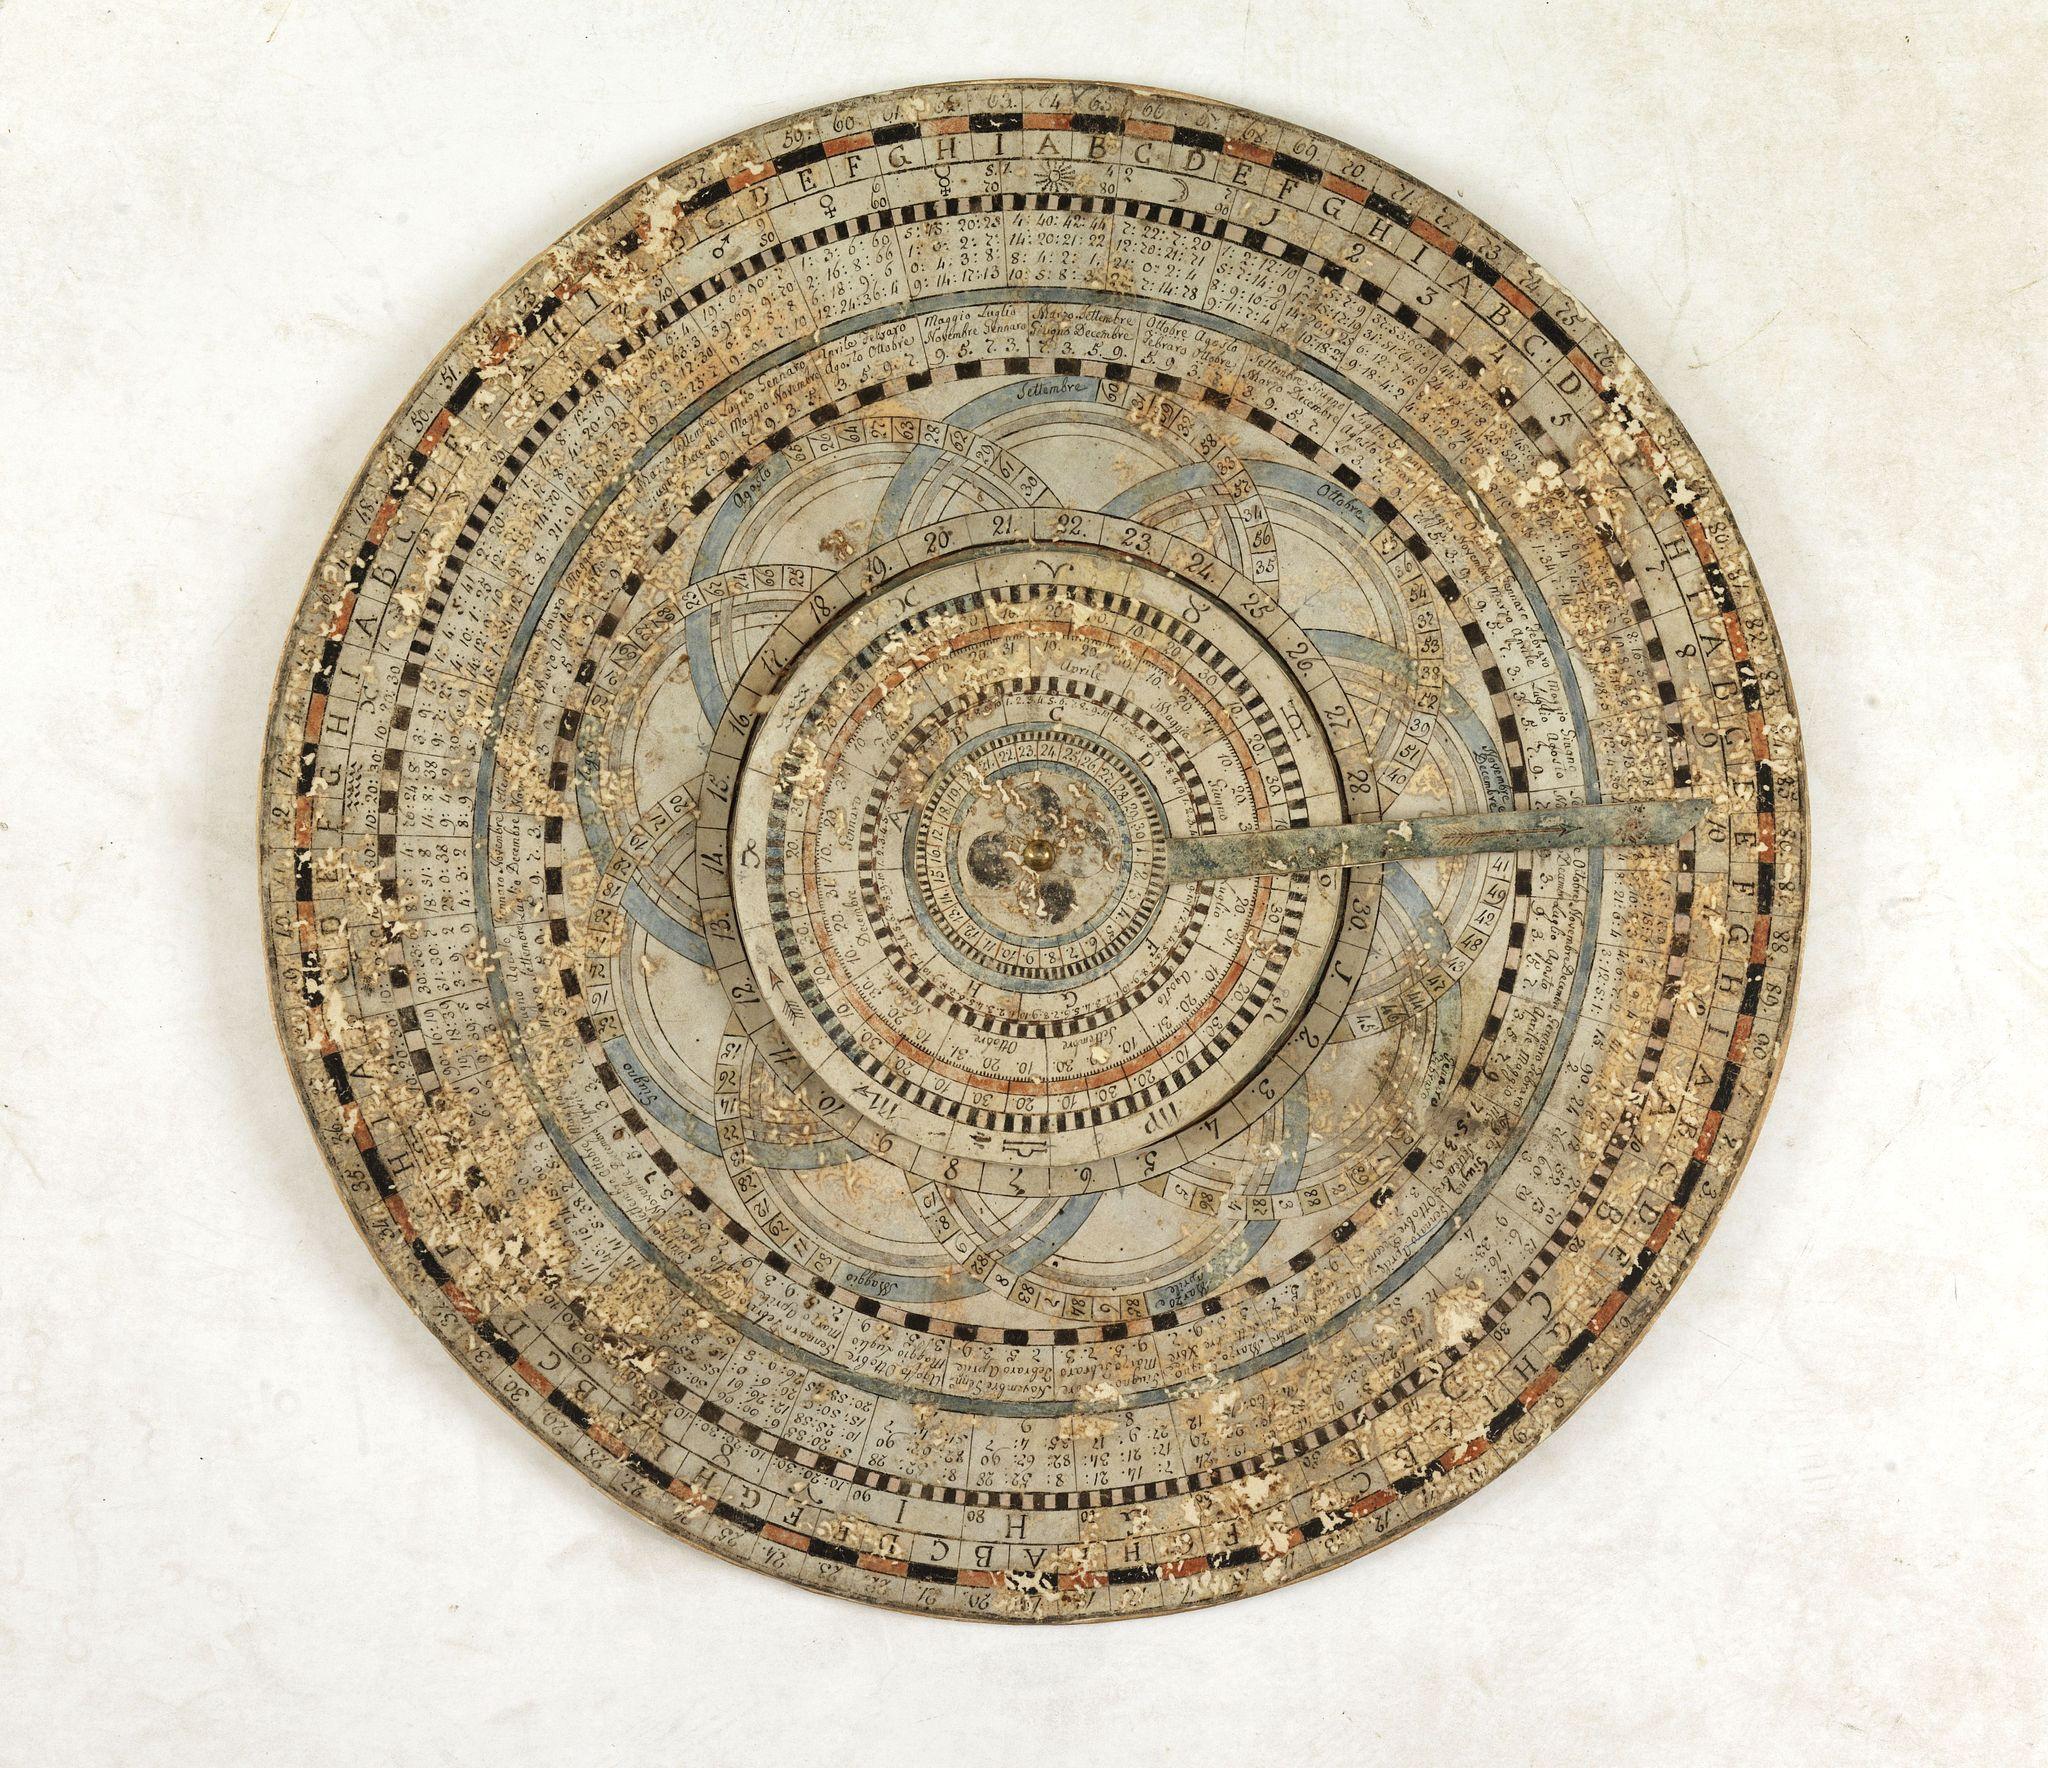 ANONYMOUS -CALENDAR  Circular luni-solar volvelle calendar of vellum